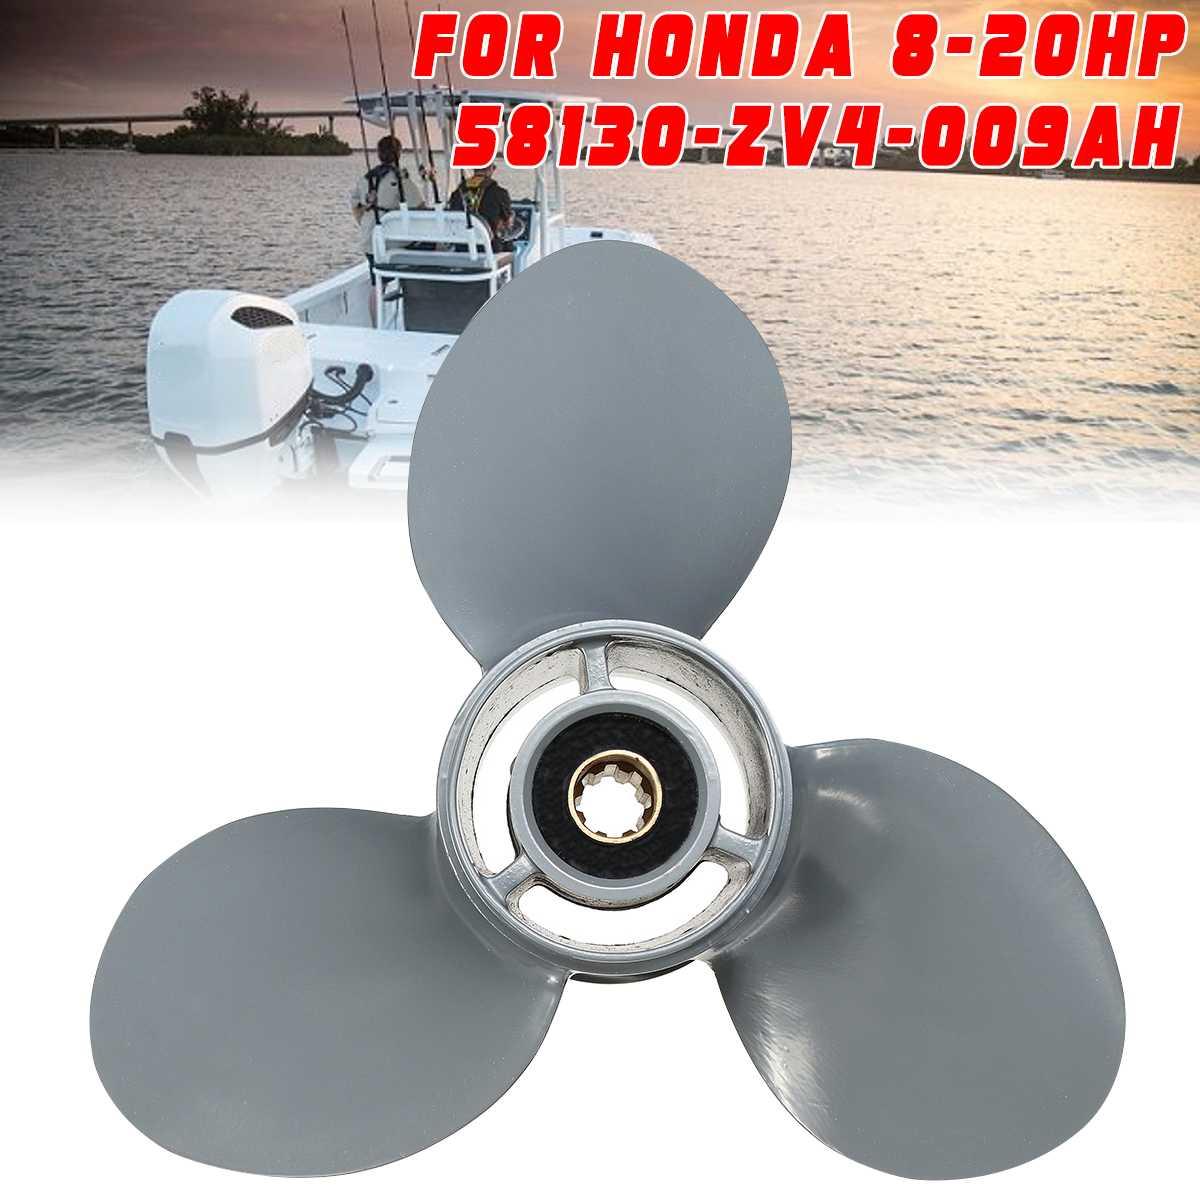 58130 ZV4 009AH 9 1 4 x 9 Propeller For Honda Outboard Engine 8 20HP Aluminum